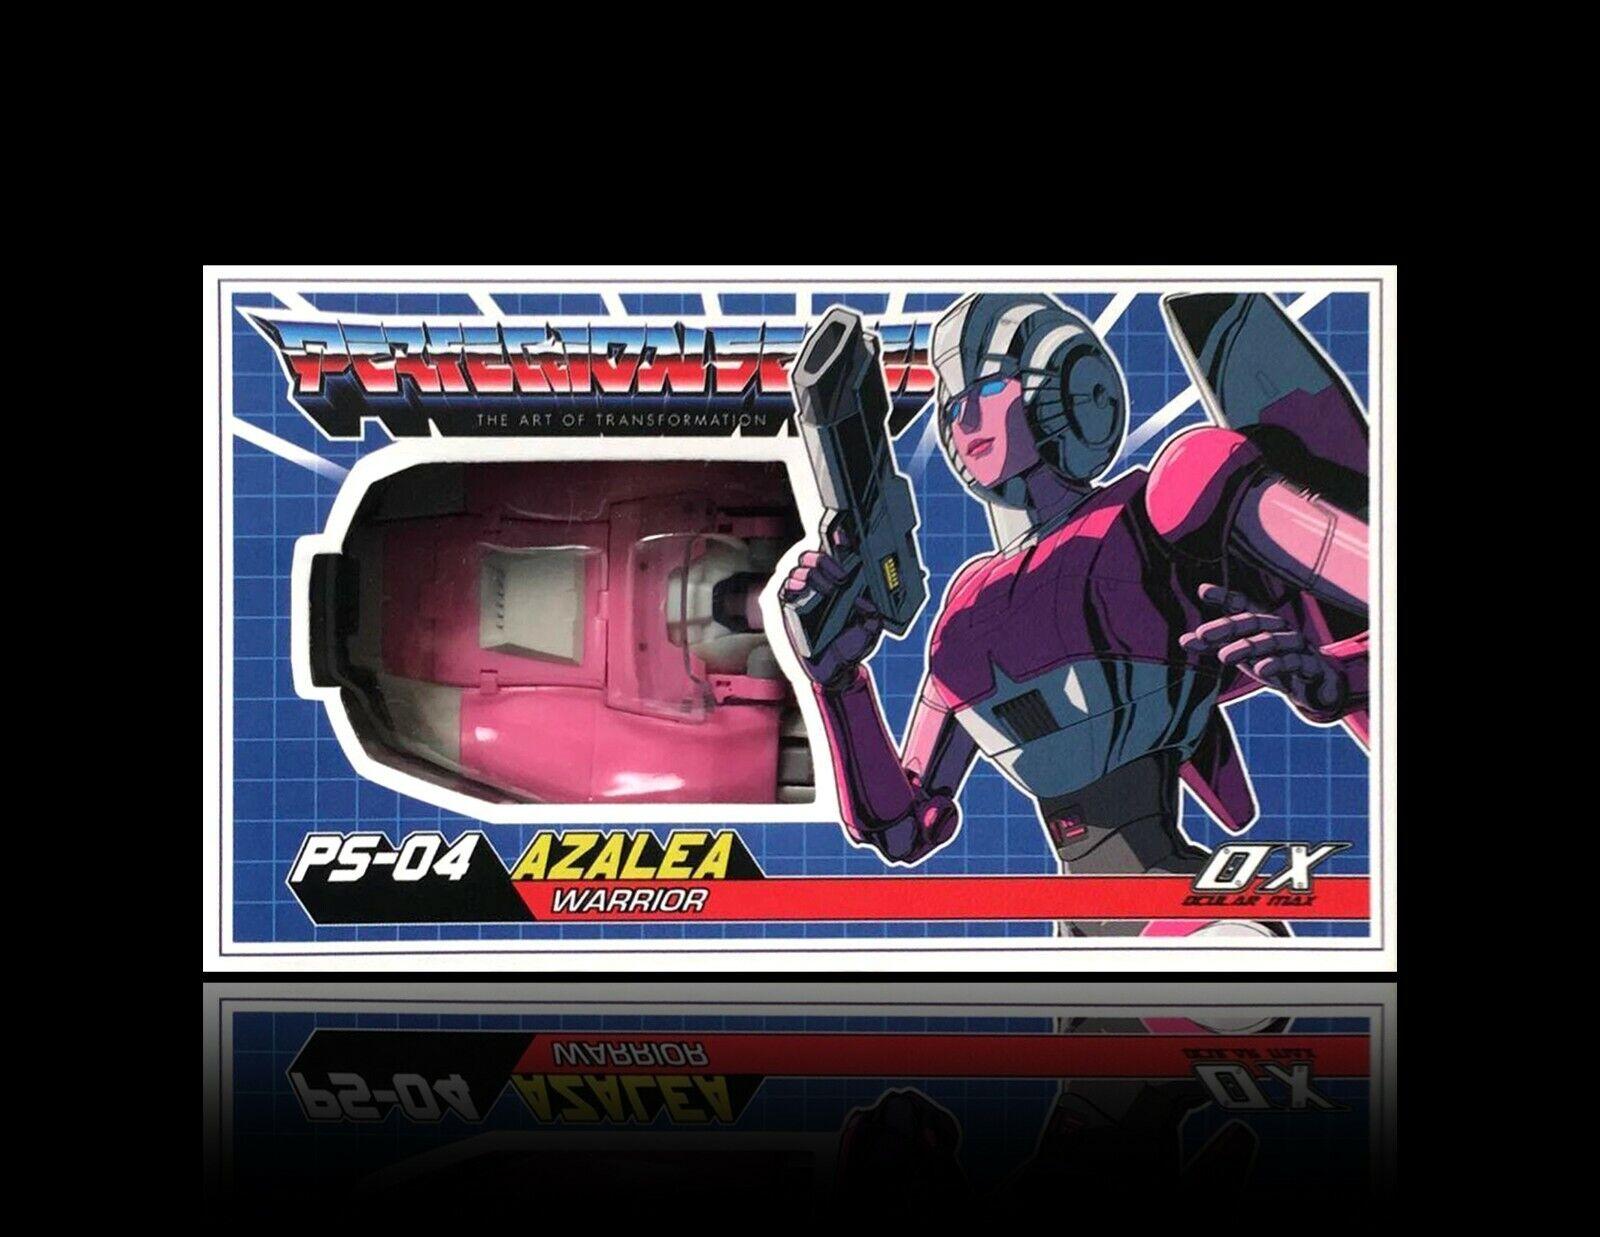 Transformers Mastermind Creations Ocular Max PS-04 Azalea   MP Acree  Brand new